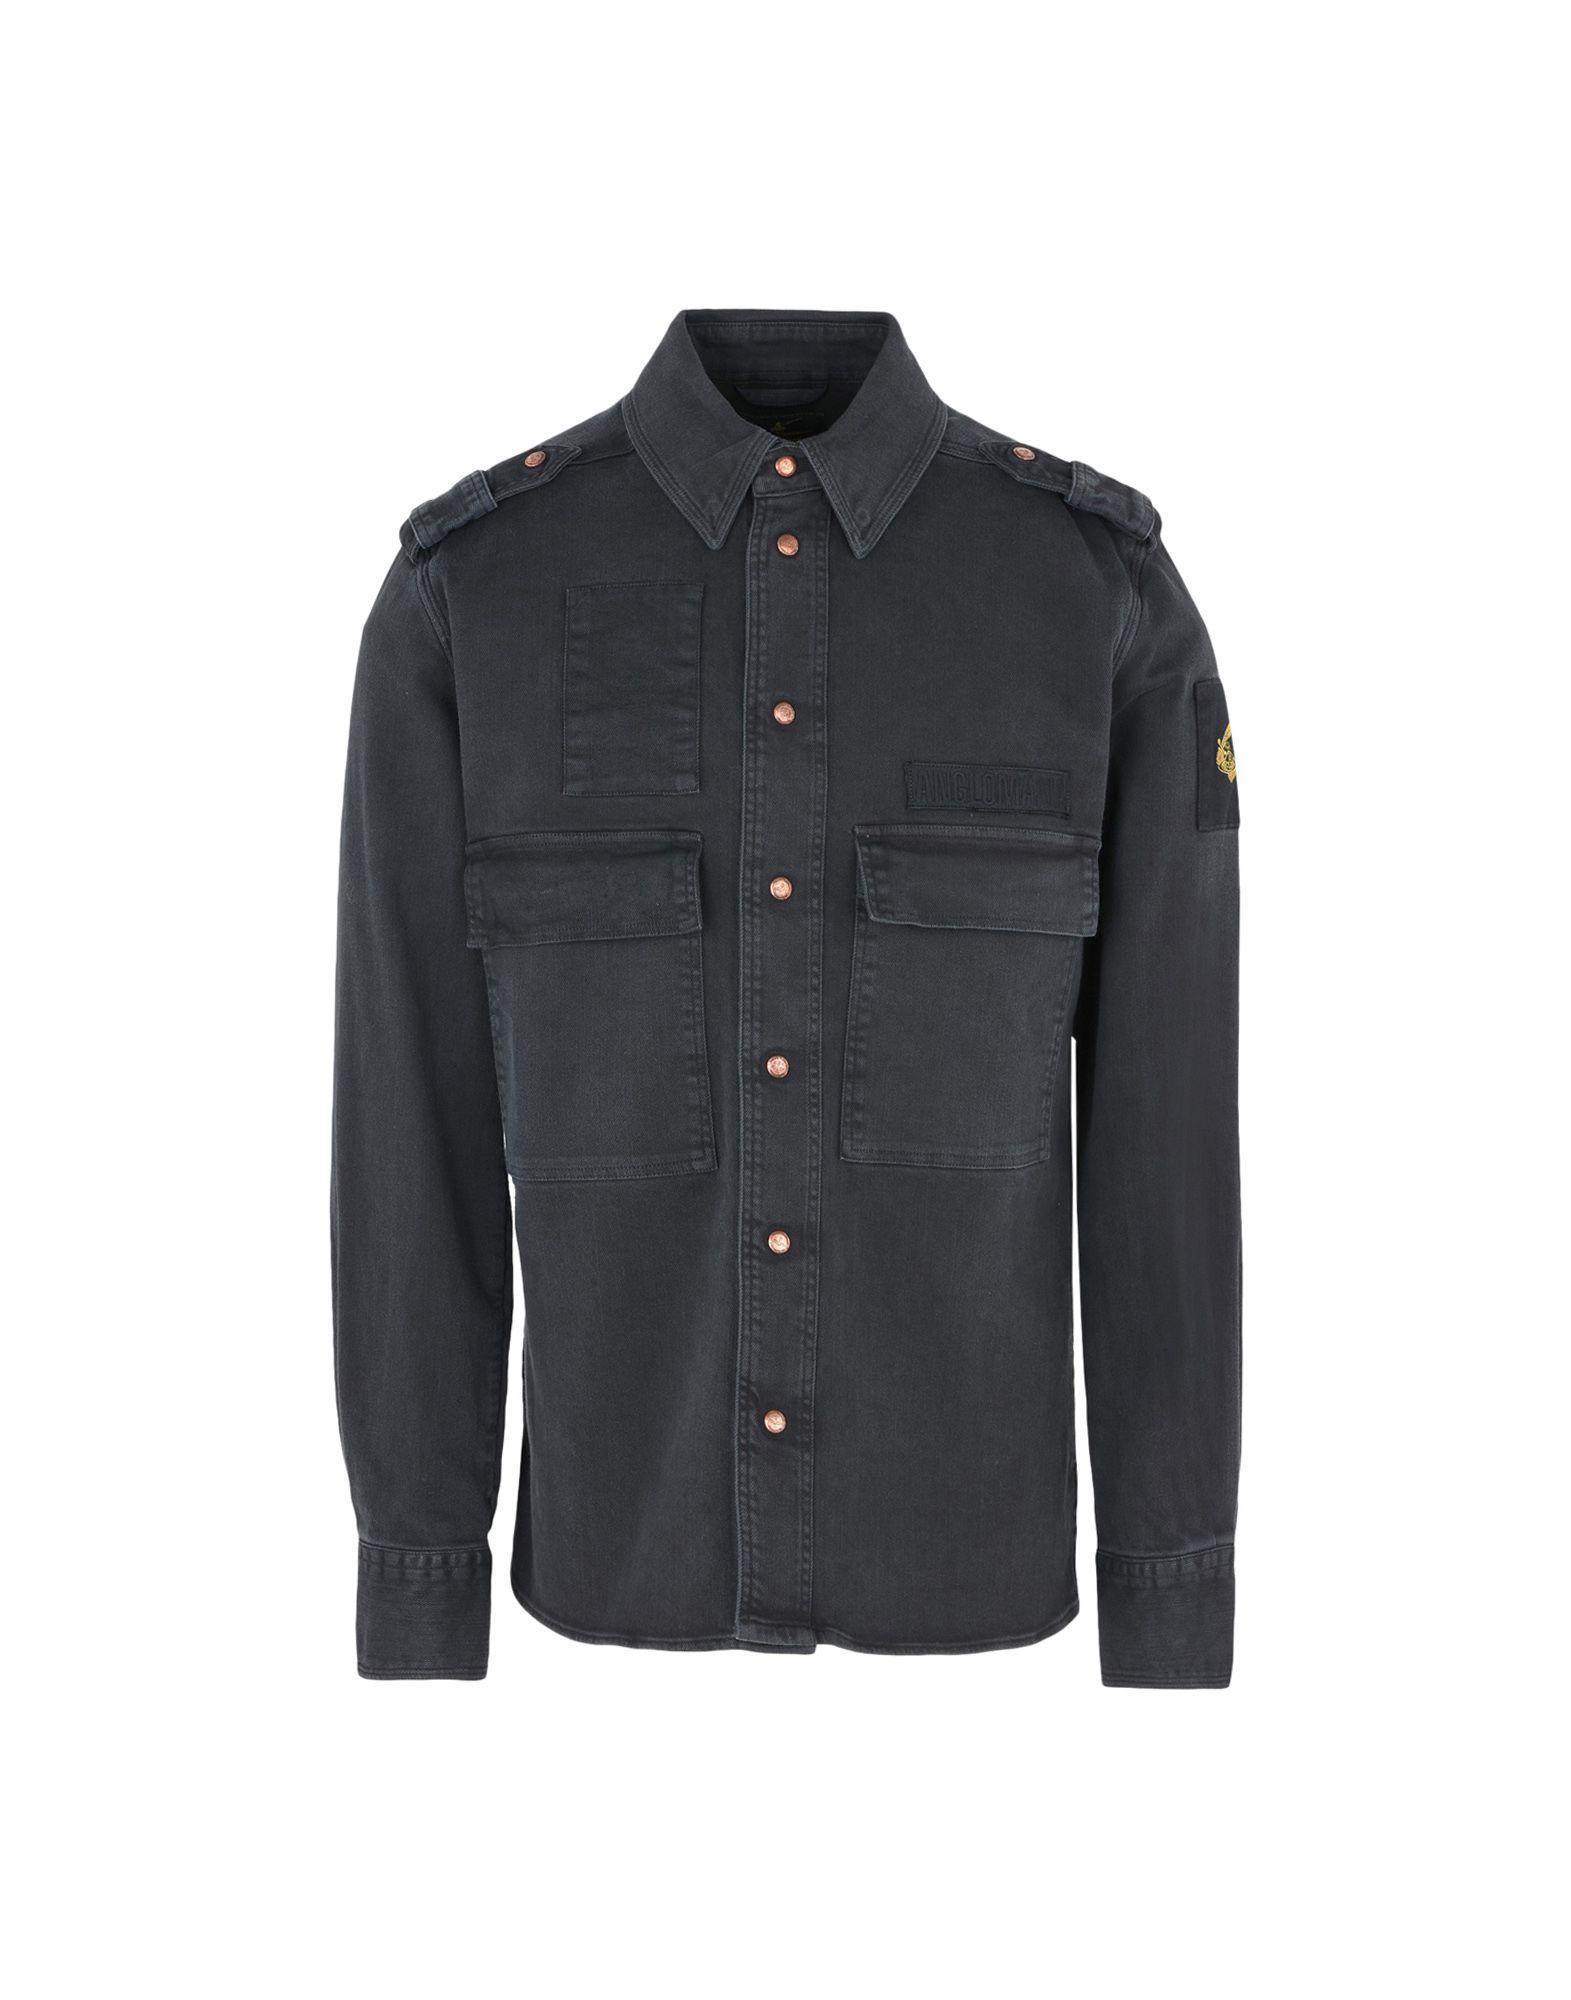 Giubbotto Jeans Vivienne Westwood Anglomania Berry Shirt - Uomo - Acquista online su